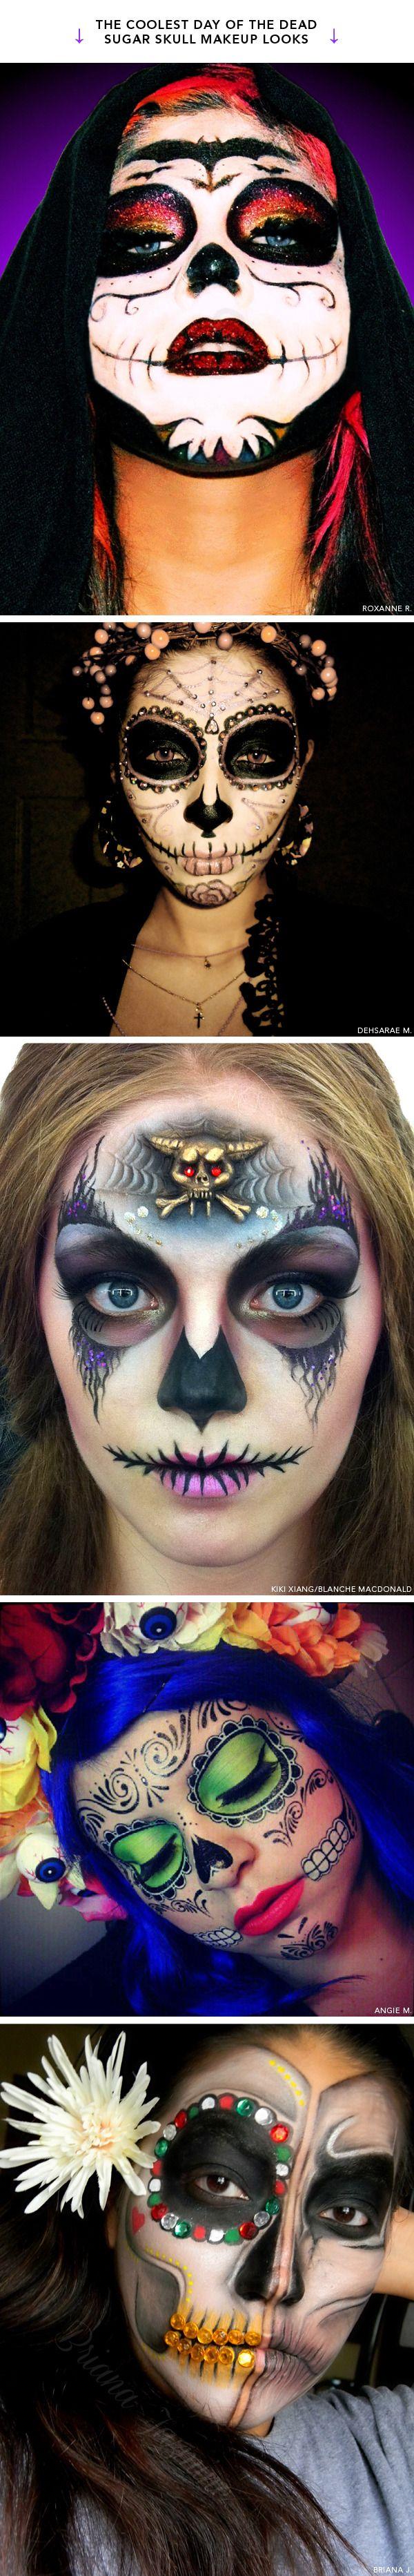 Dead or alive you be the judge sugar skull makeup skull makeup